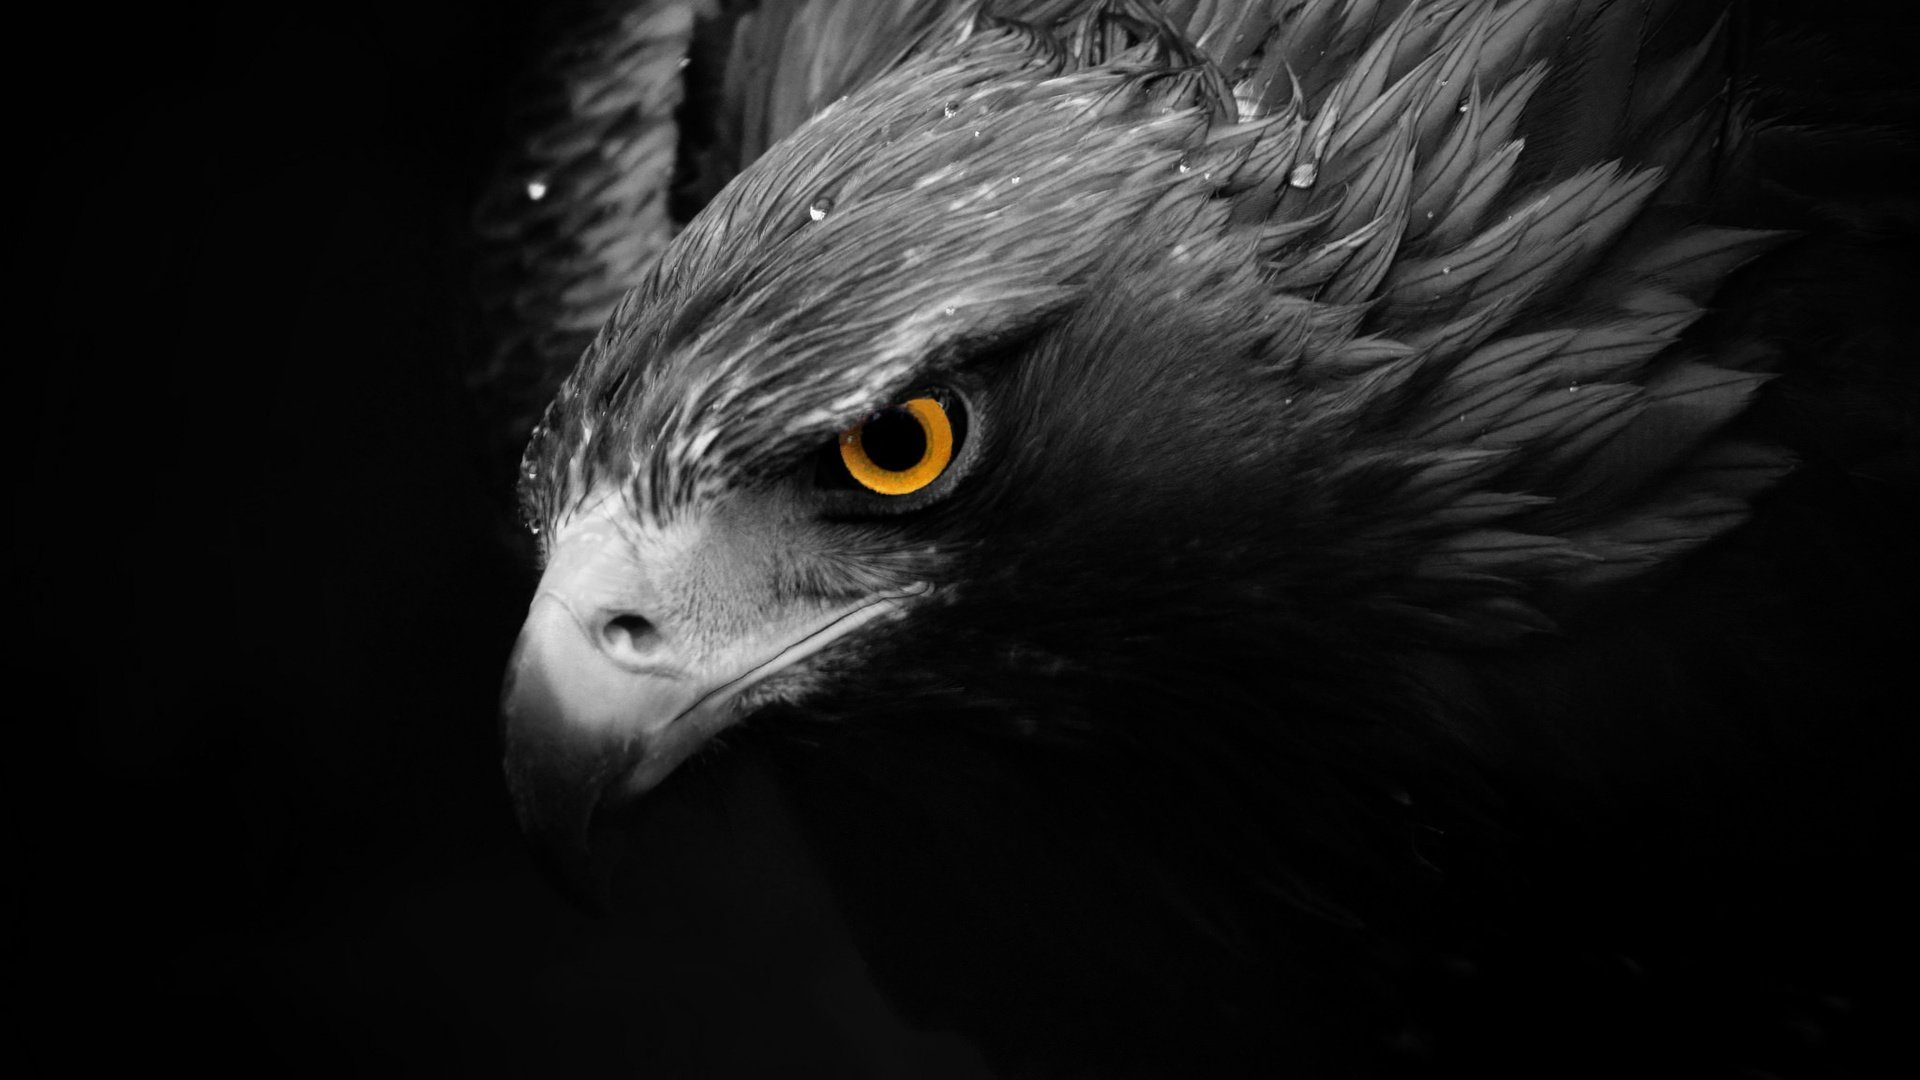 Free Download Eagle Wallpaper ID:231161 1080p For Desktop